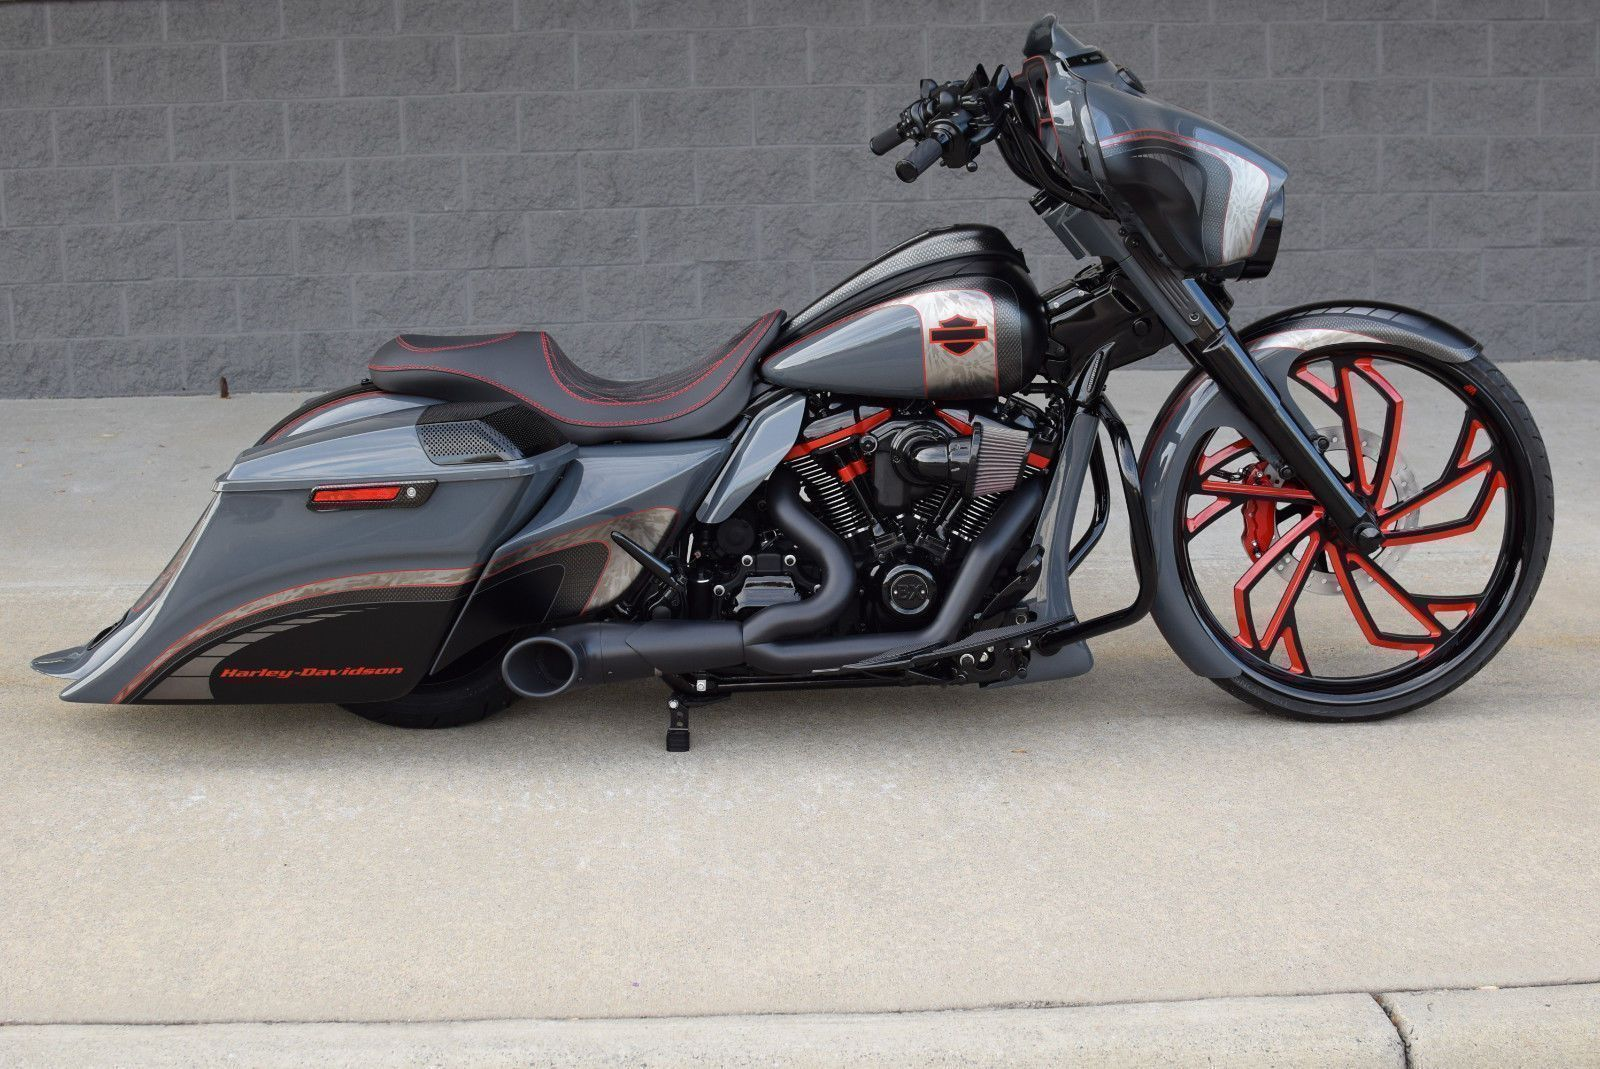 eBay: 2018 Harley-Davidson Touring 2018 STREET GLIDE BAGGER *1 OF A ...